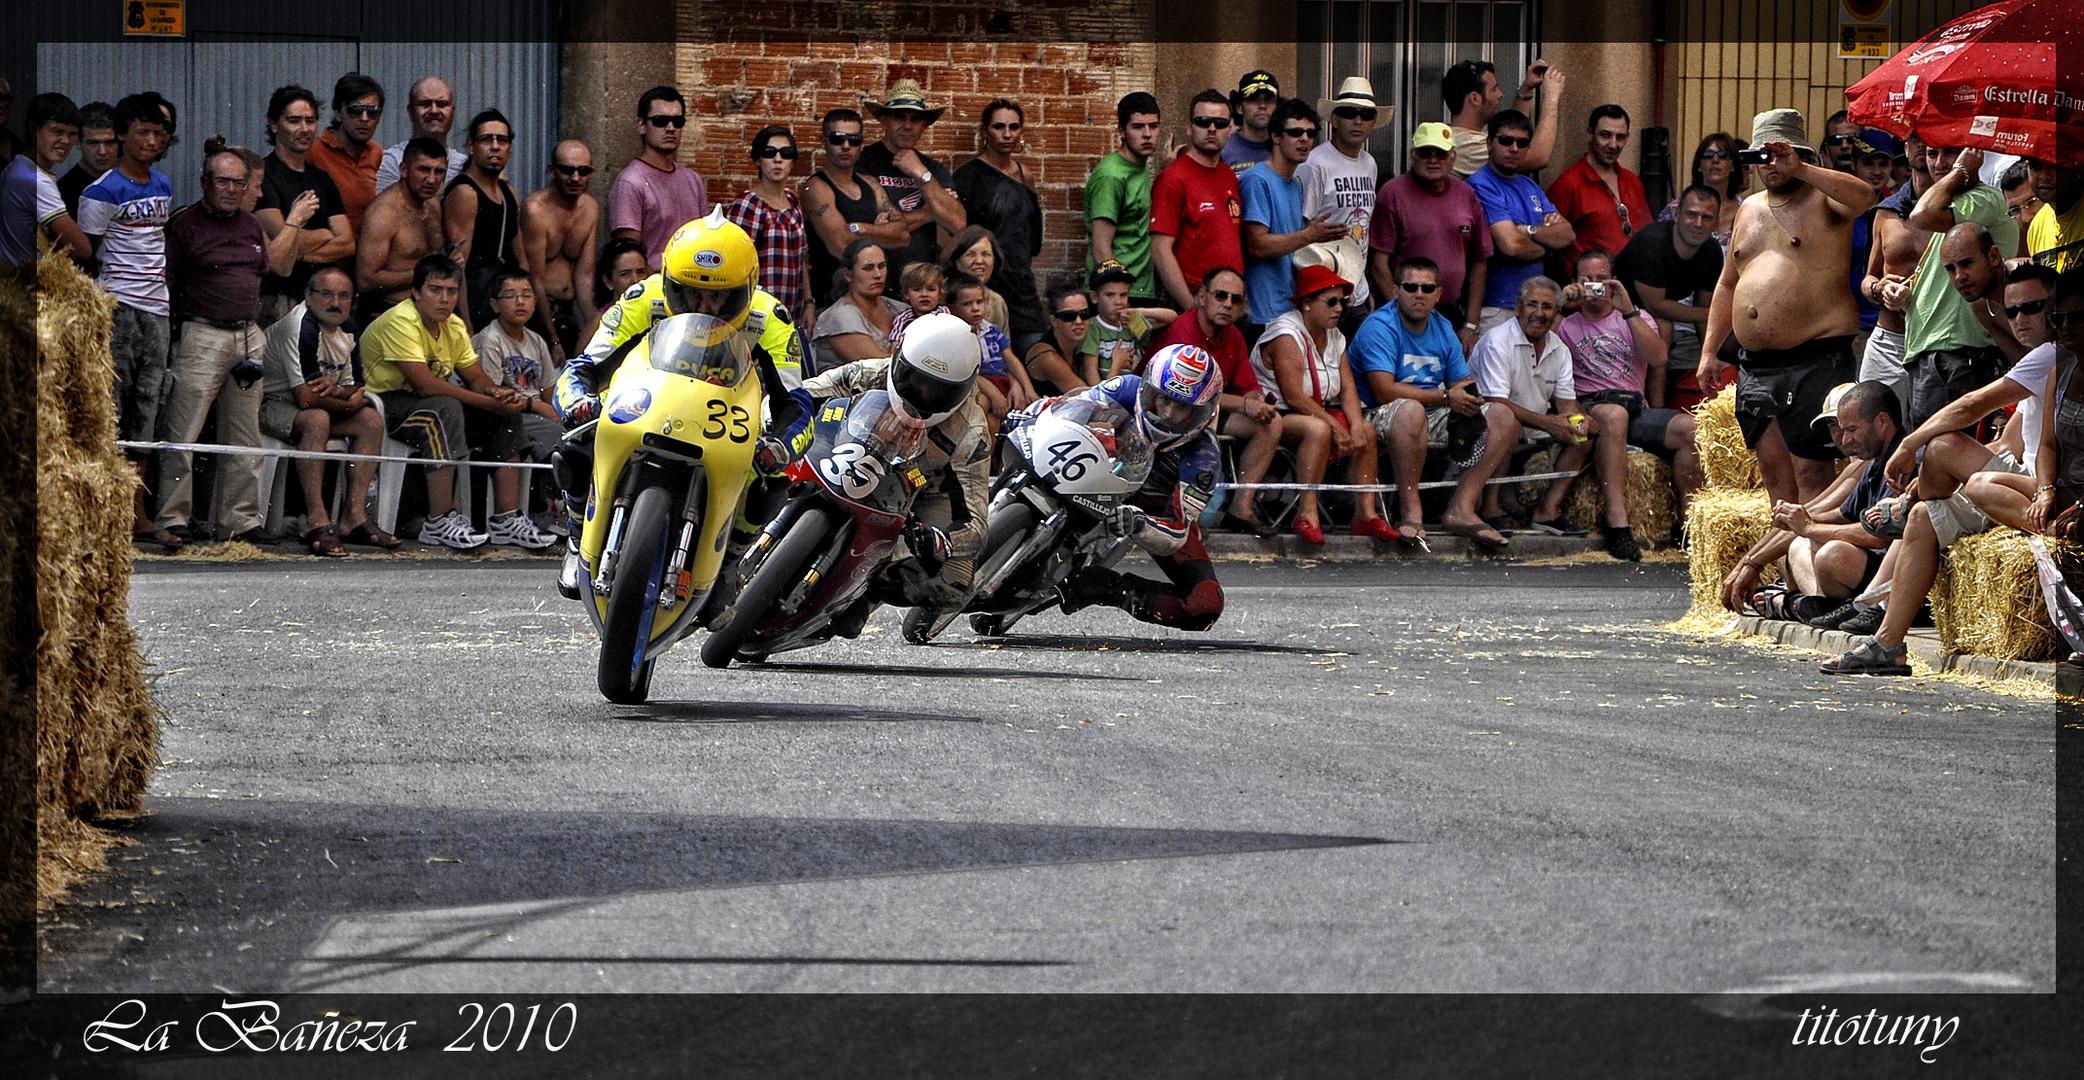 La Bañeza 2010